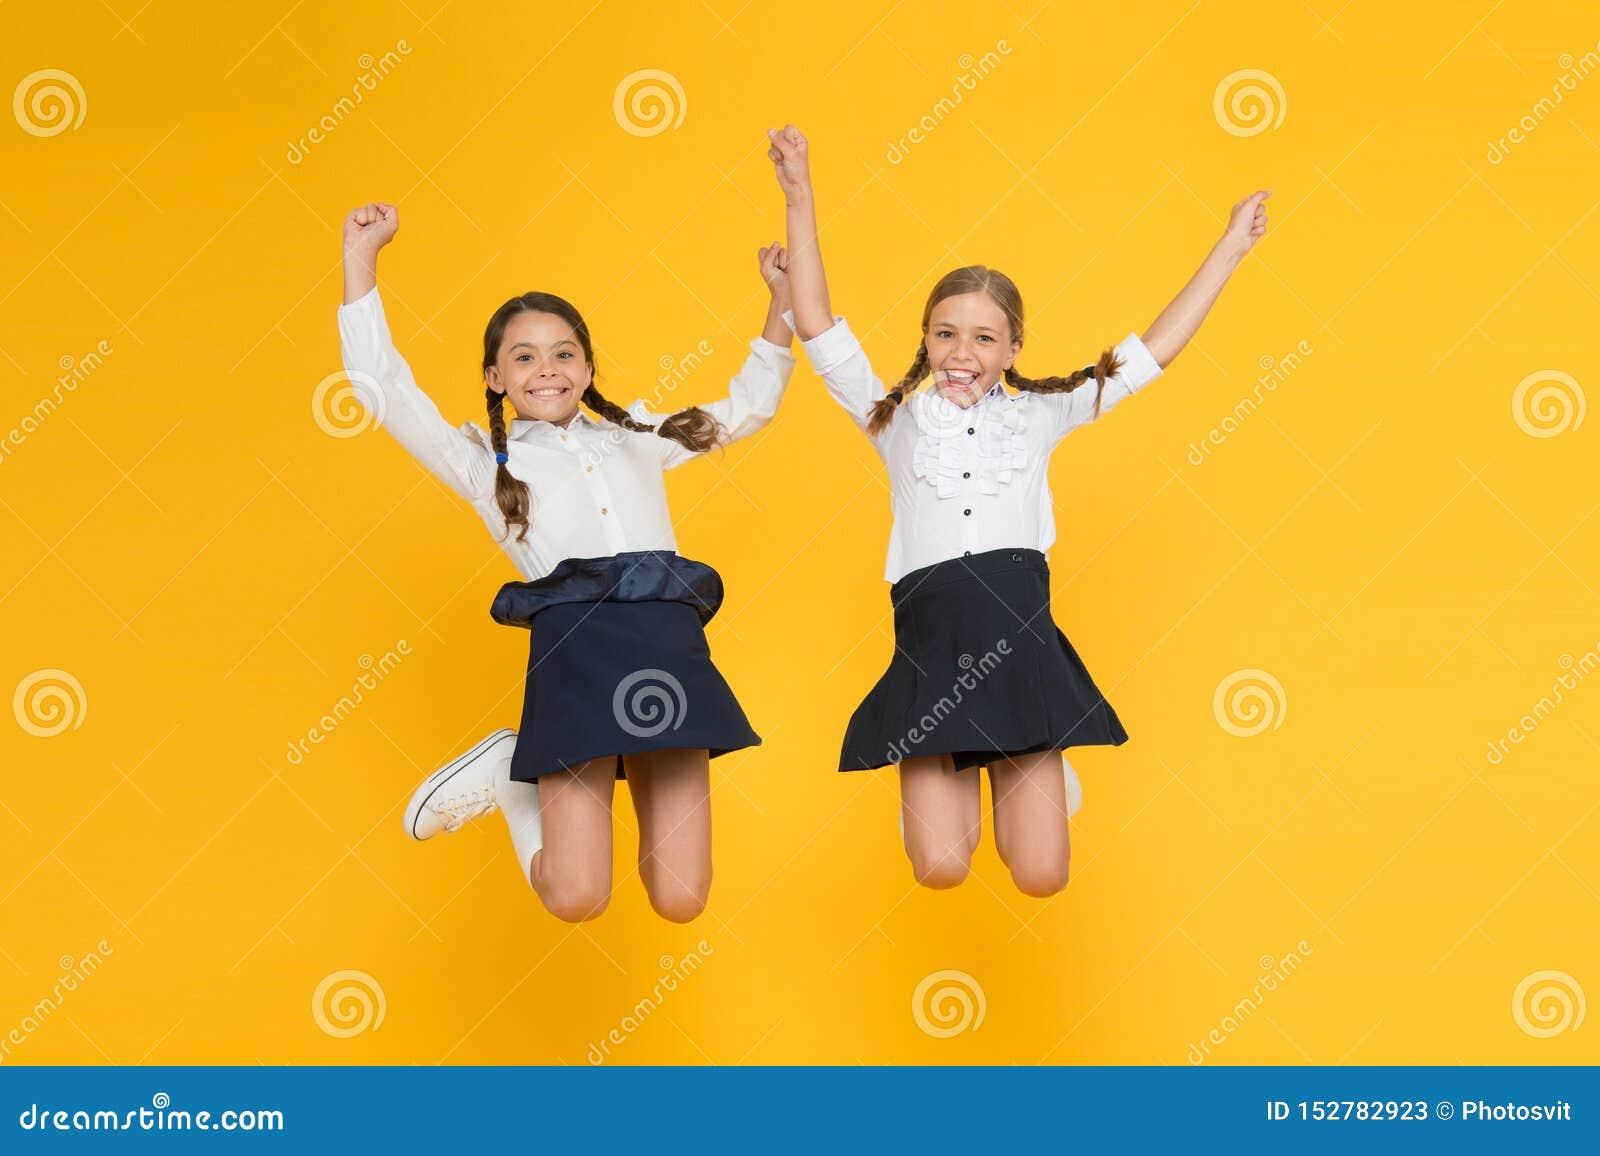 Classmates having fun at school Friends adorable pupils. Schoolgirls formal style perfect school uniform. Happy